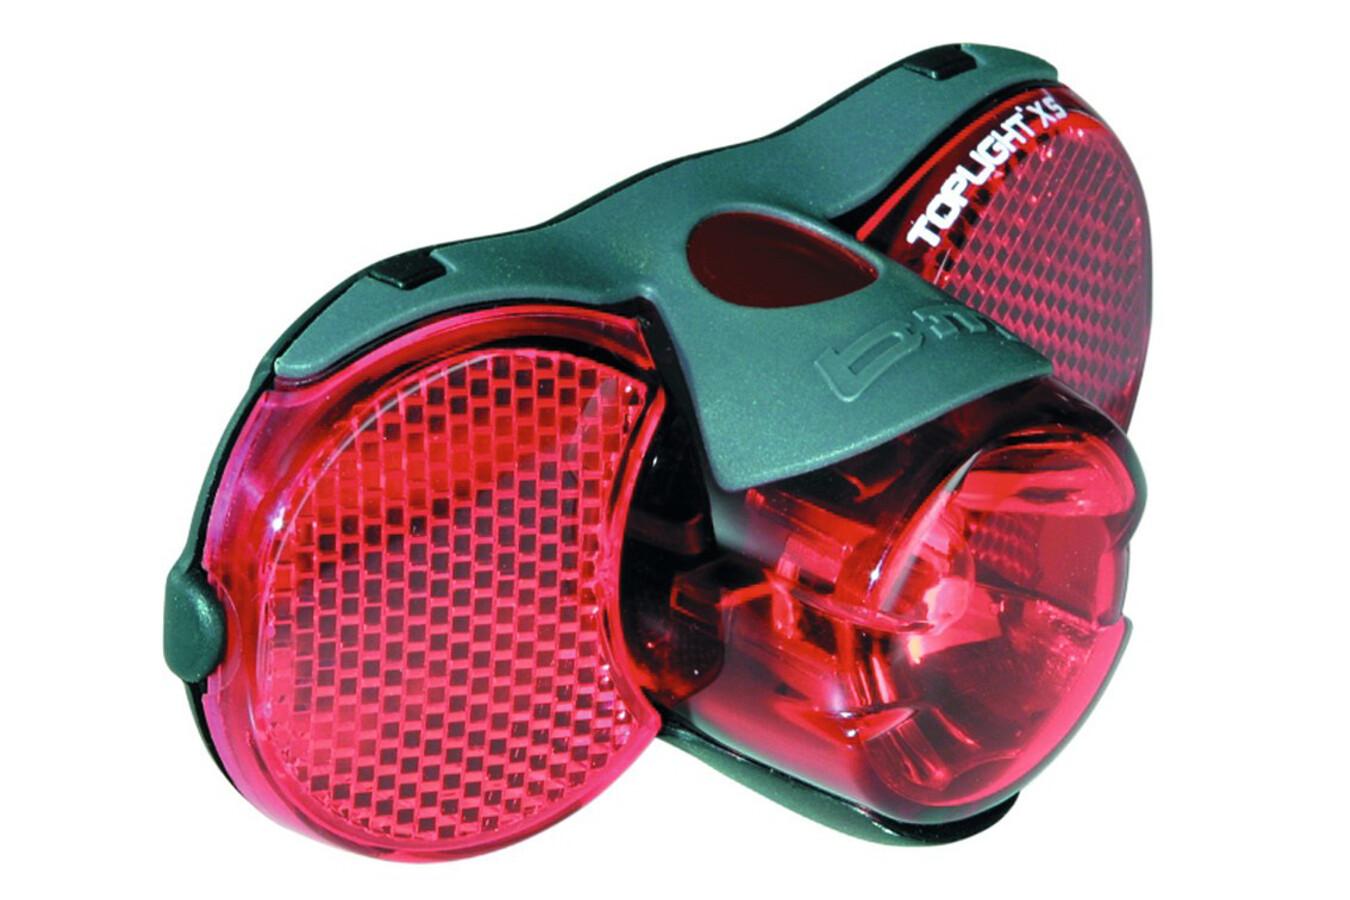 Busch + Müller B&M D-Toplight XS Dynamo-Rücklicht schwarz/rot Fahrraddynamo~Dynamo~Fahrradbeleuchtung~Fahrradlicht~Fahrrad Beleuchtung~Dynamo Beleuchtung